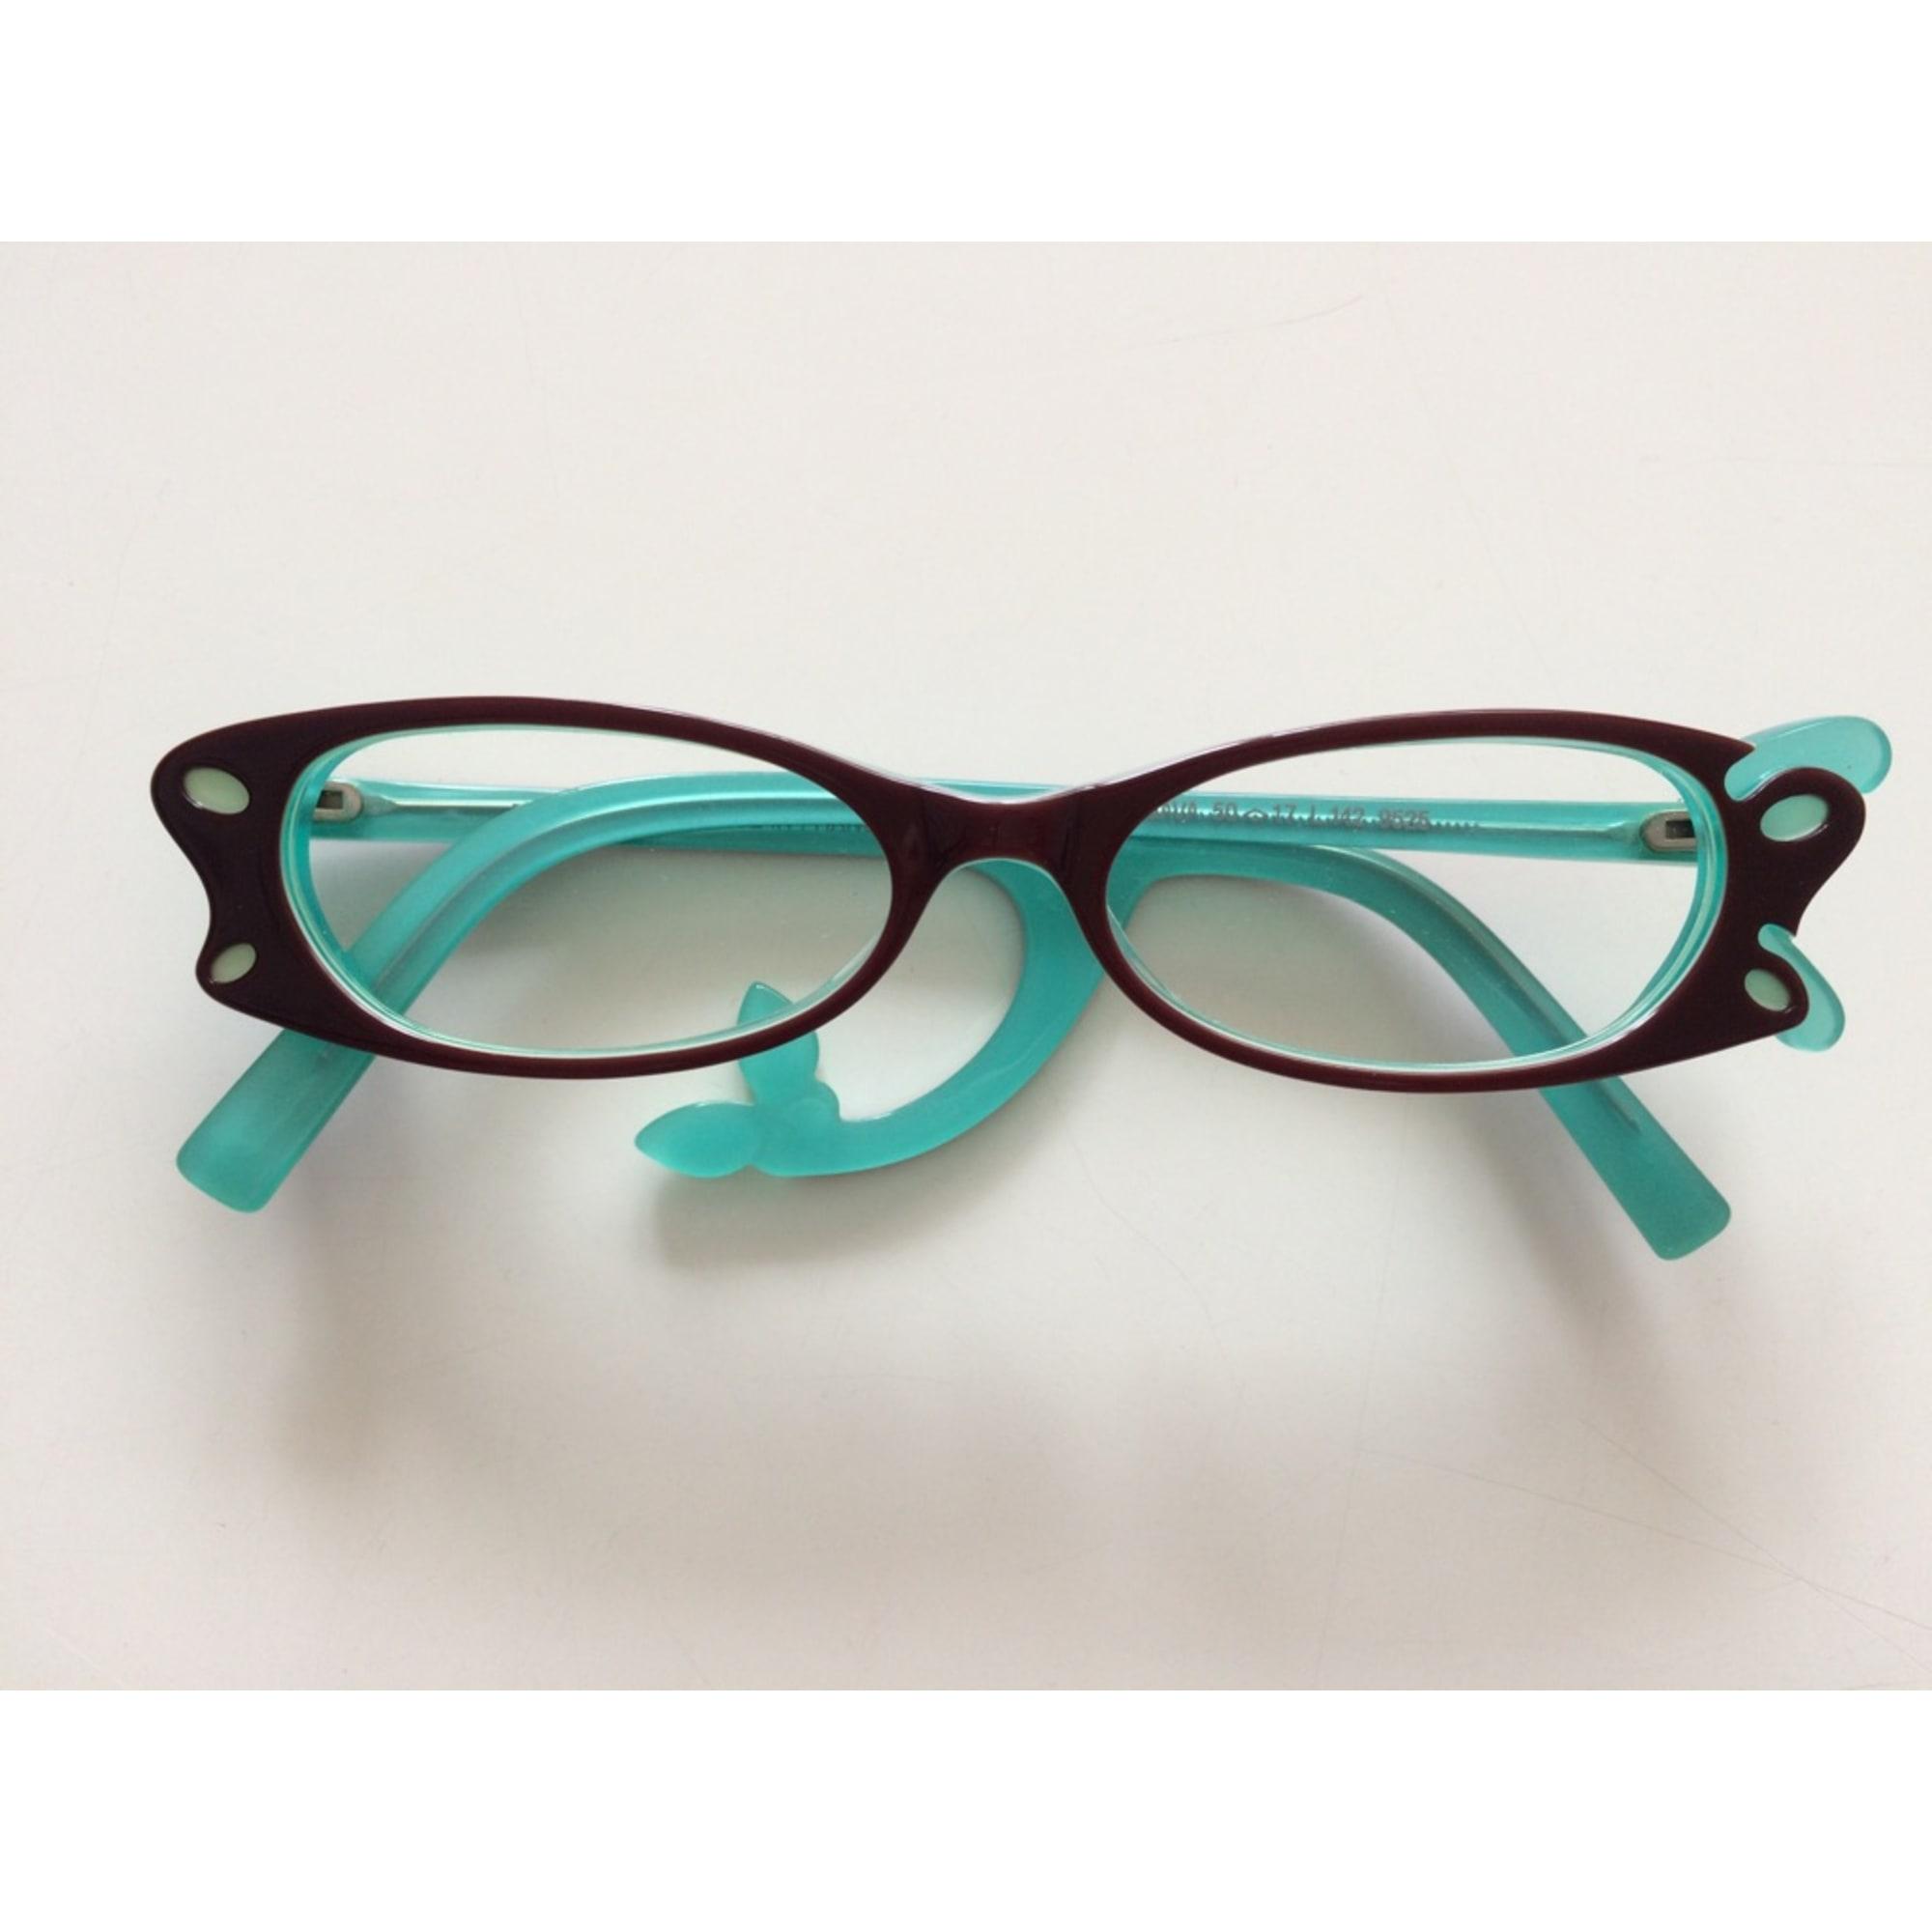 Monture de lunettes BOZ EYEWEAR multicouleur - 6503598 b1f5444e66e8